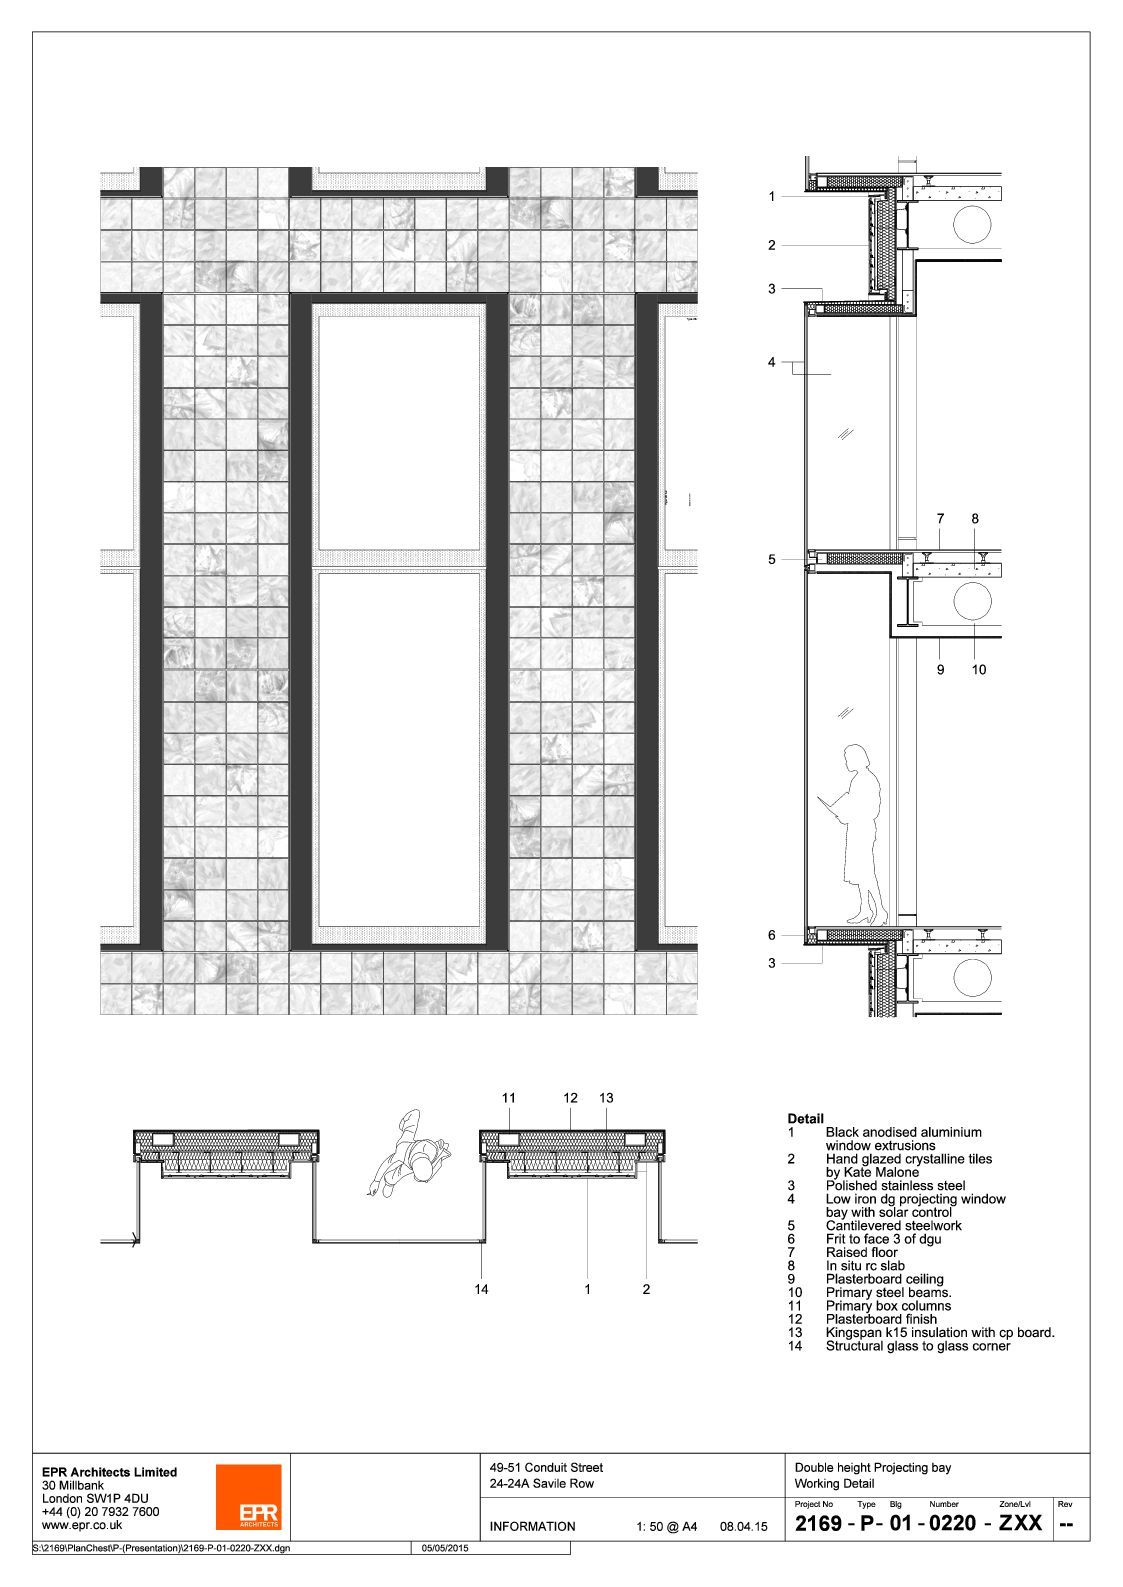 Gallery Of 24 Savile Row Epr Architects 30 Doubleglazingdiagram01jpg